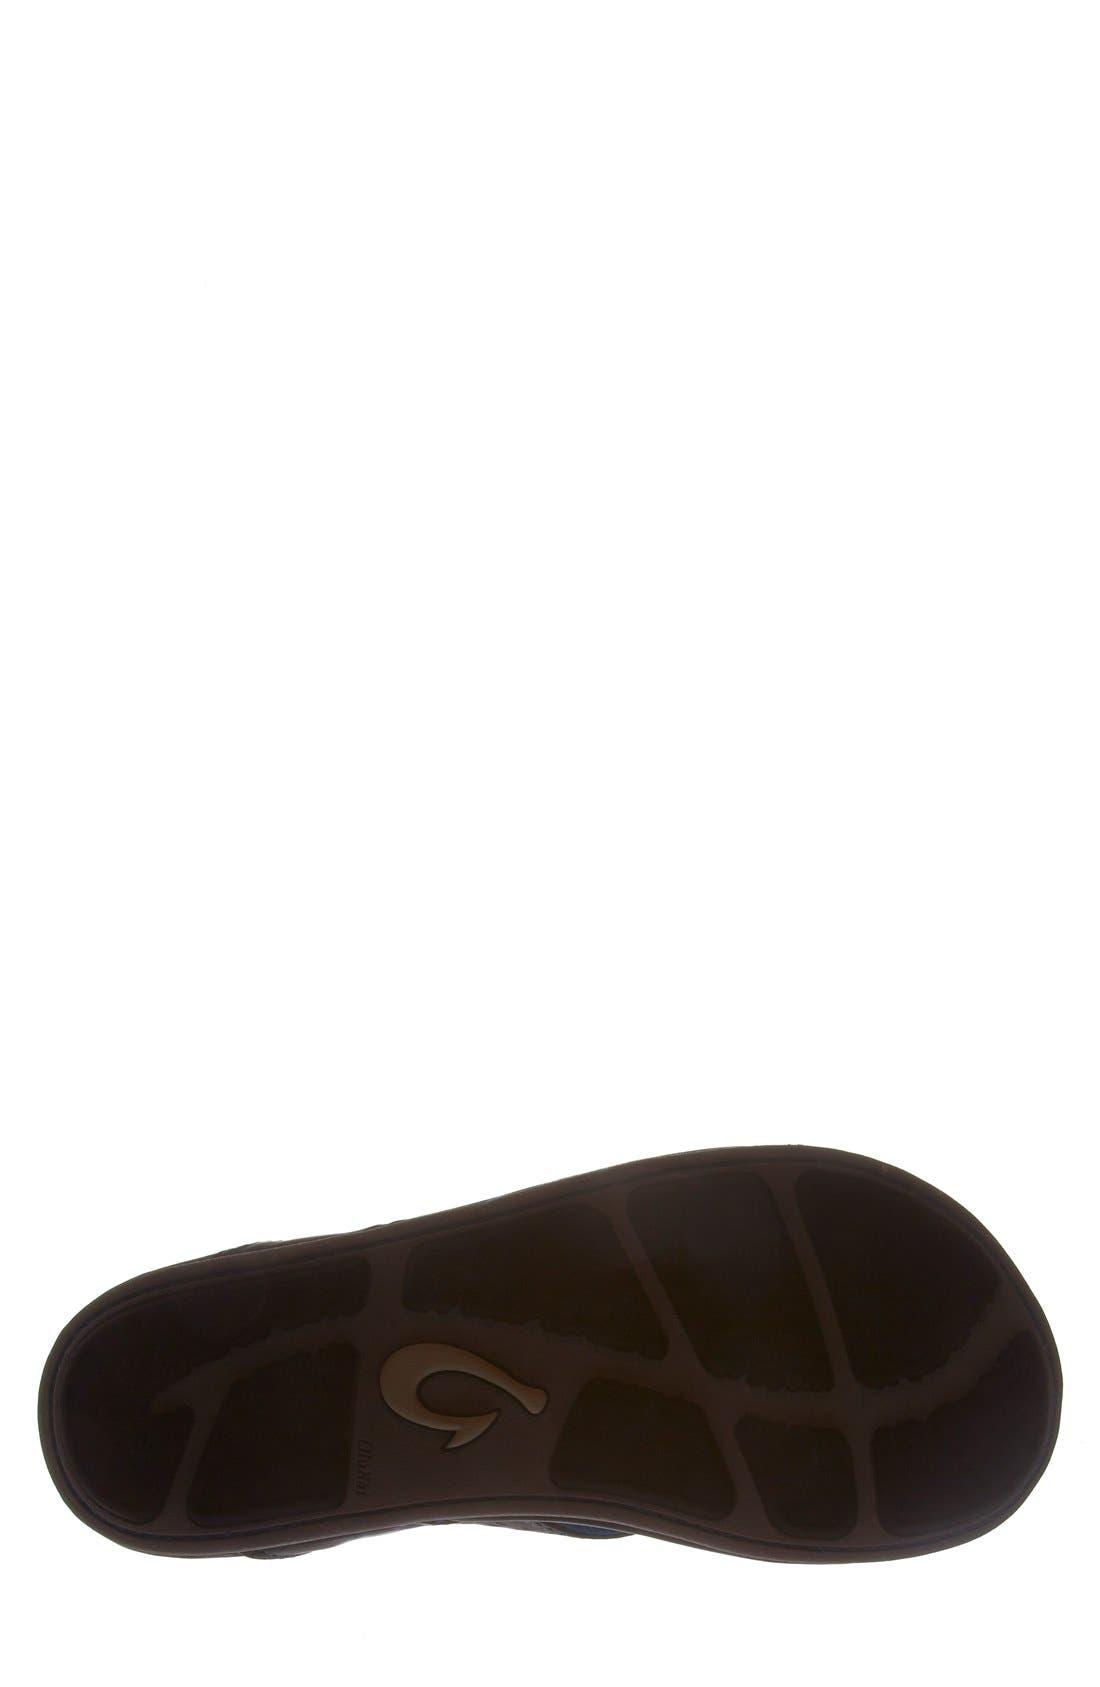 OLUKAI,                             'Kekoa' Water Resistant Perforated Flip Flop,                             Alternate thumbnail 3, color,                             029